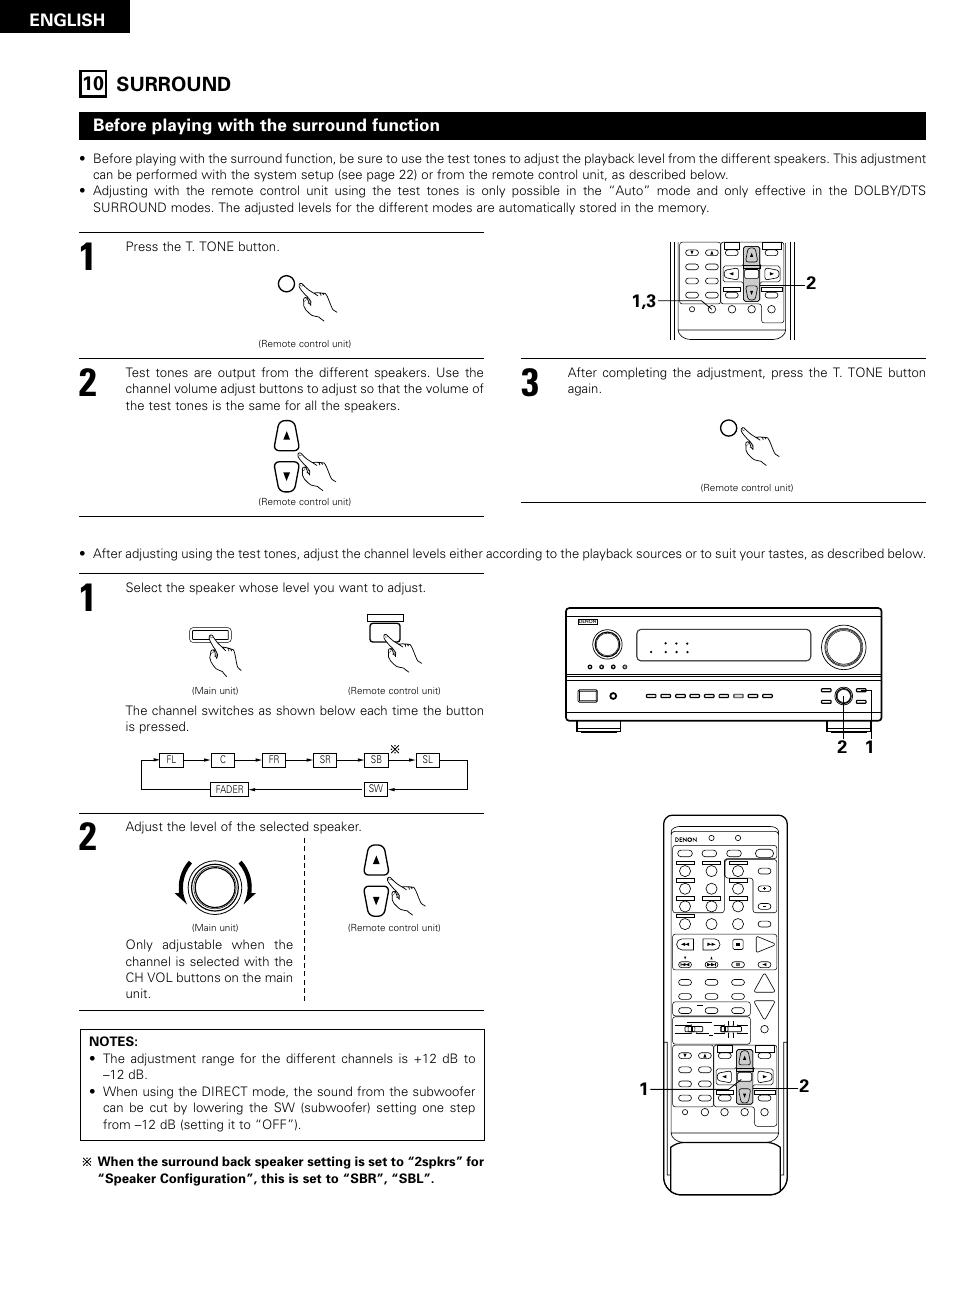 Surround, 42 10 surround, English | Denon AVR-2802/982 User